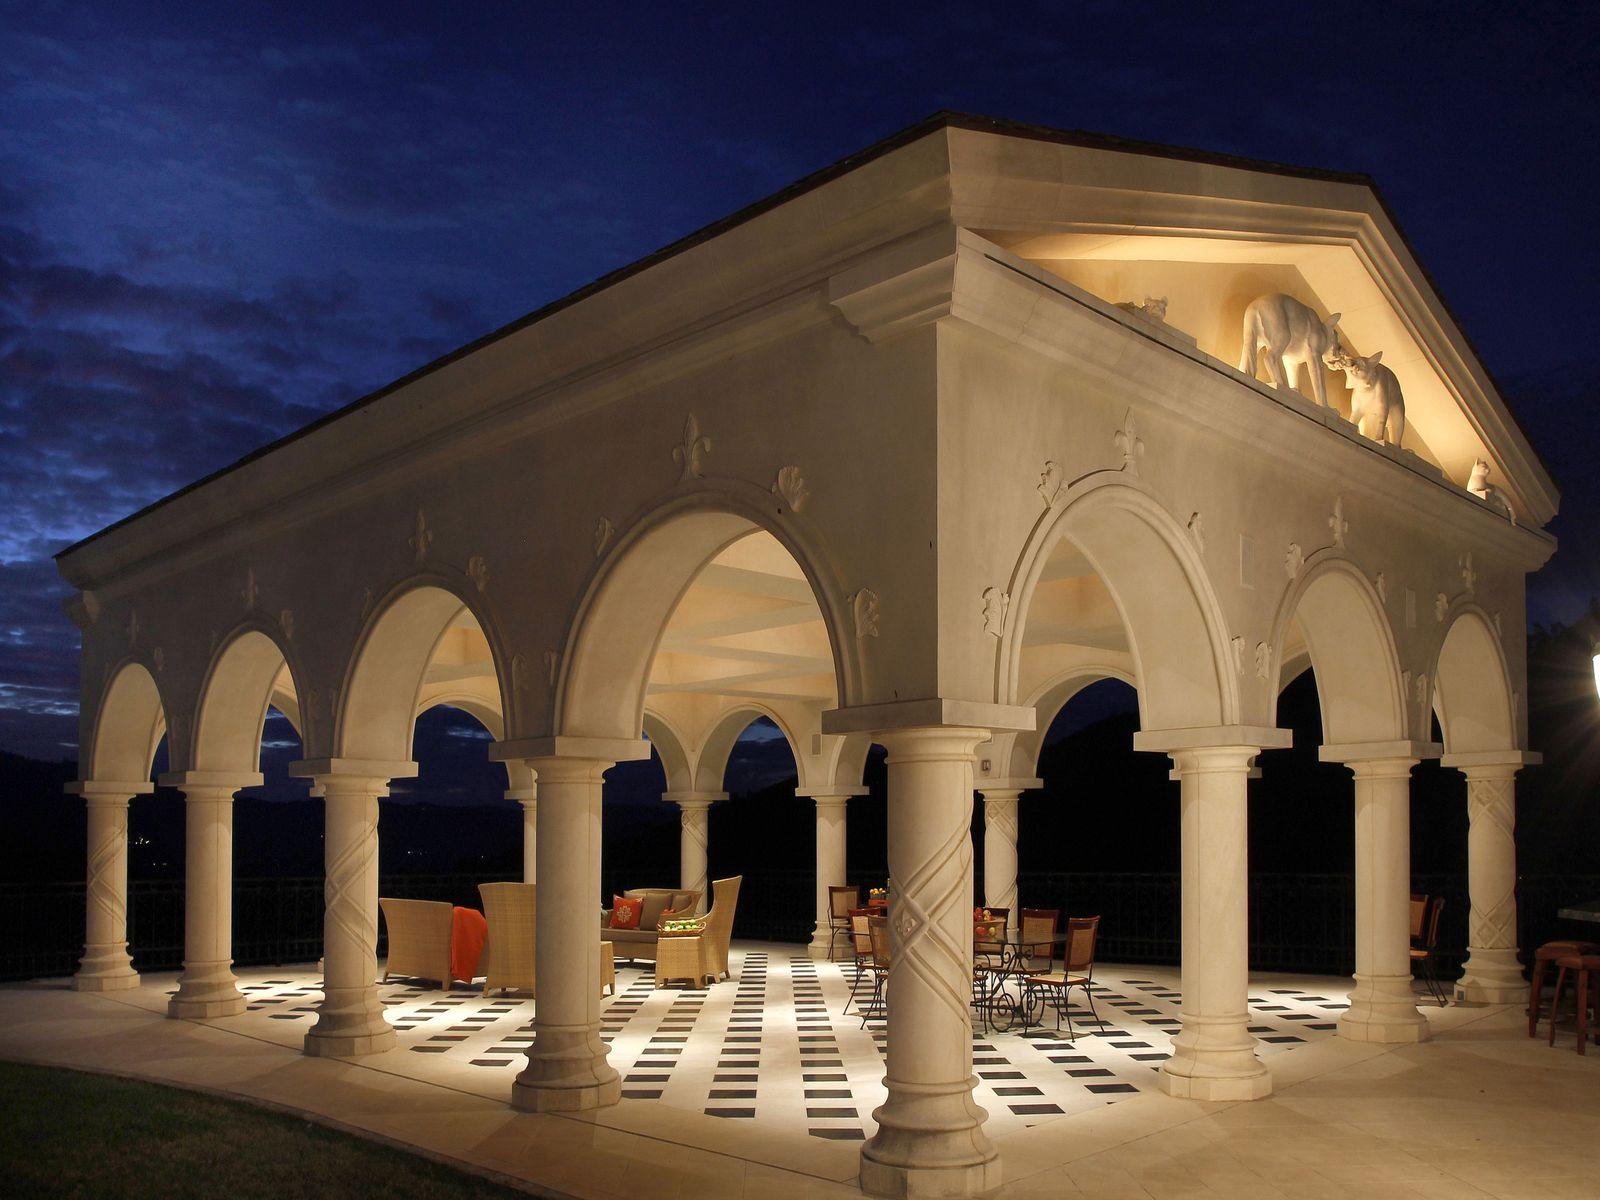 1050+/- sq.ft outdoor pavilion.